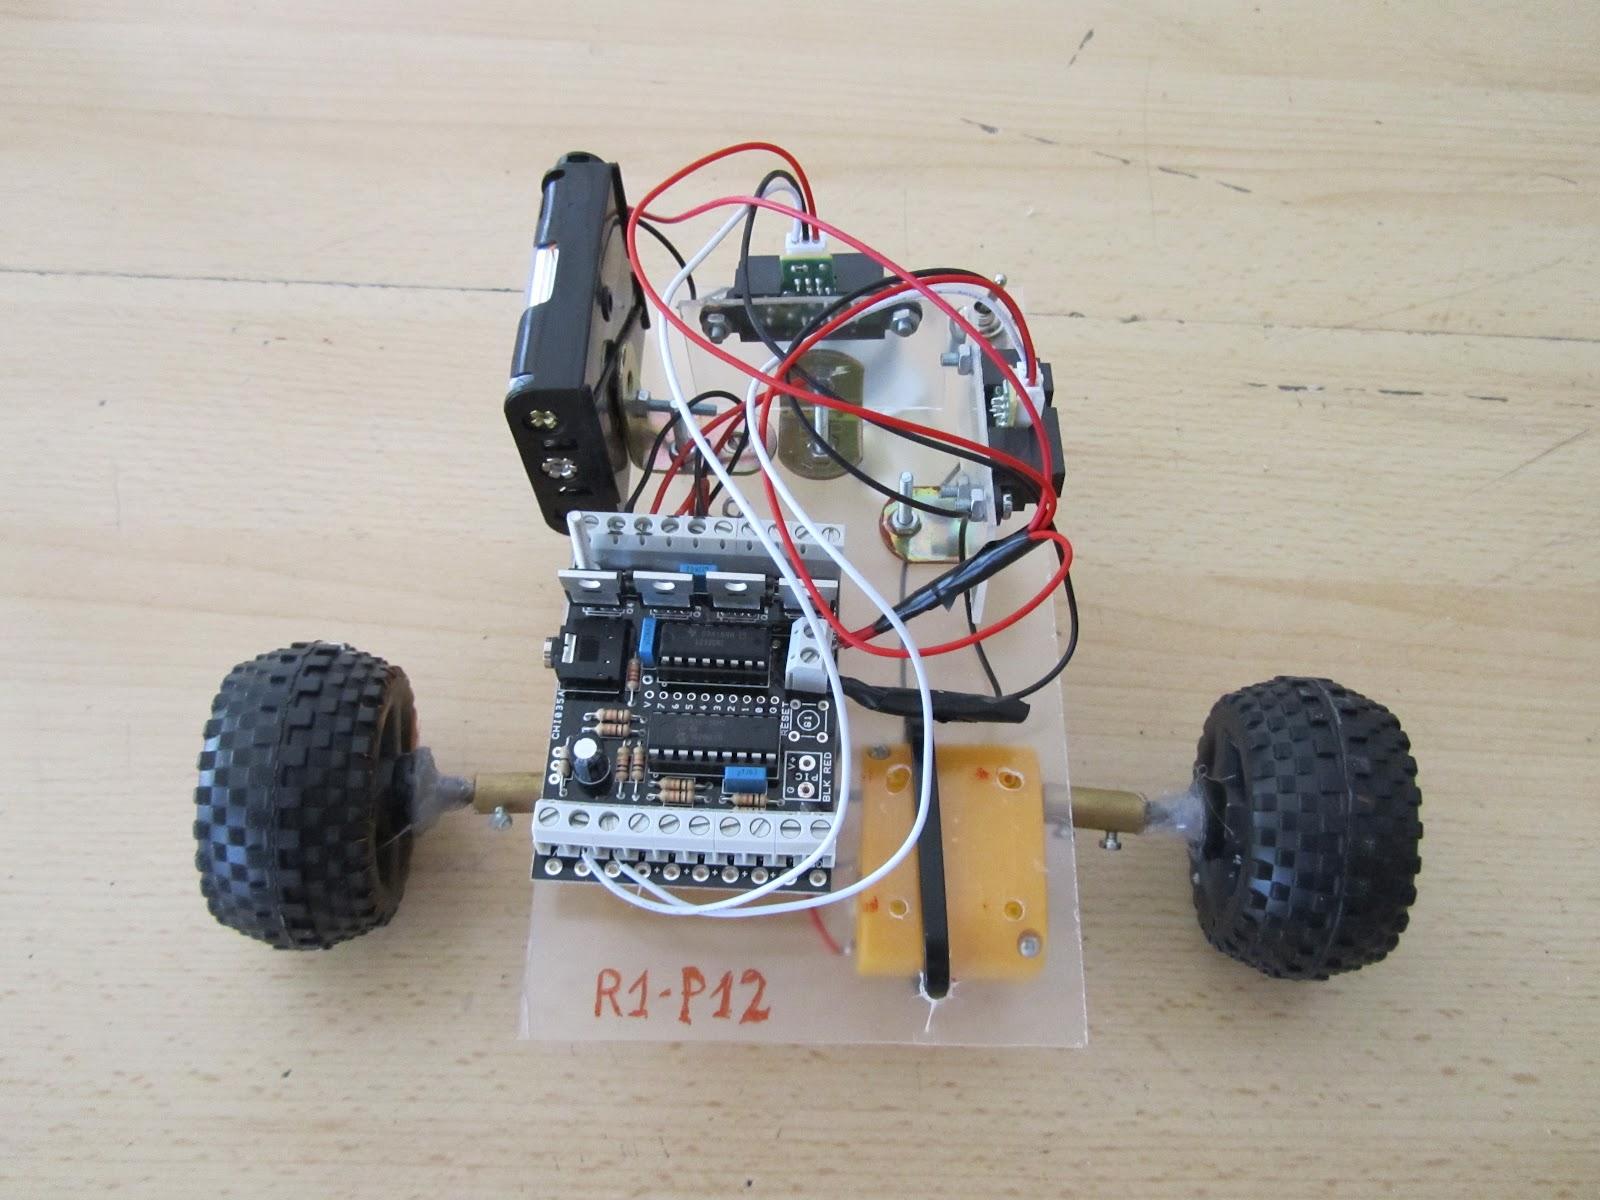 Robótica escolar e s o pr robot resuelve